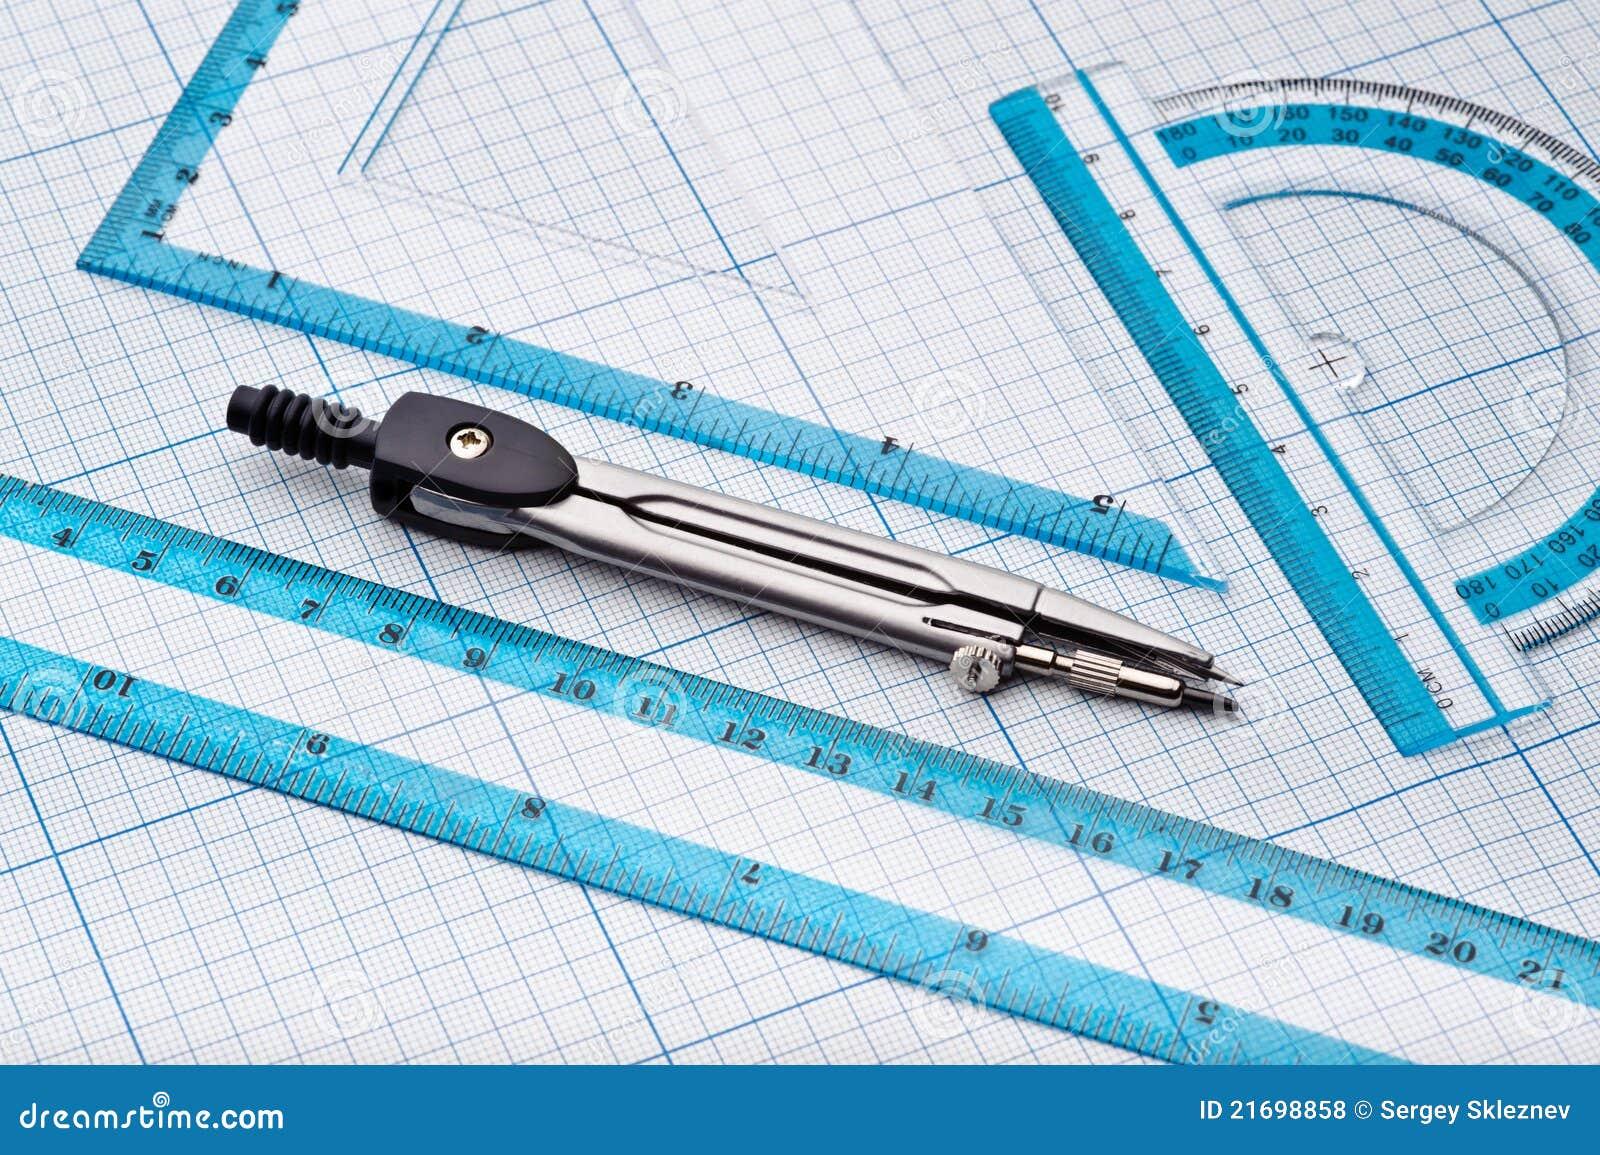 geometry tools stock photo  image of ruler  tool  equipment